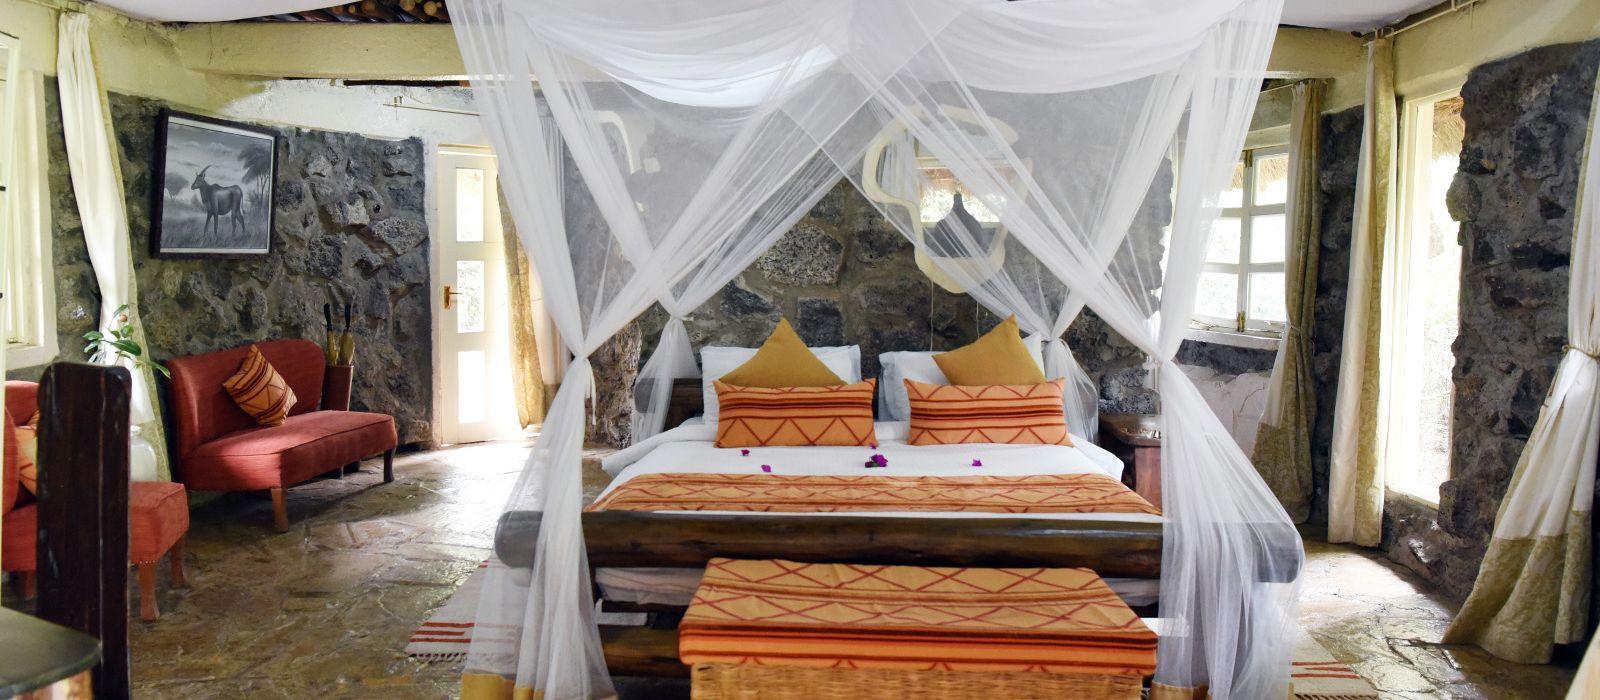 Hotel Mbweha Safari Camp Kenya